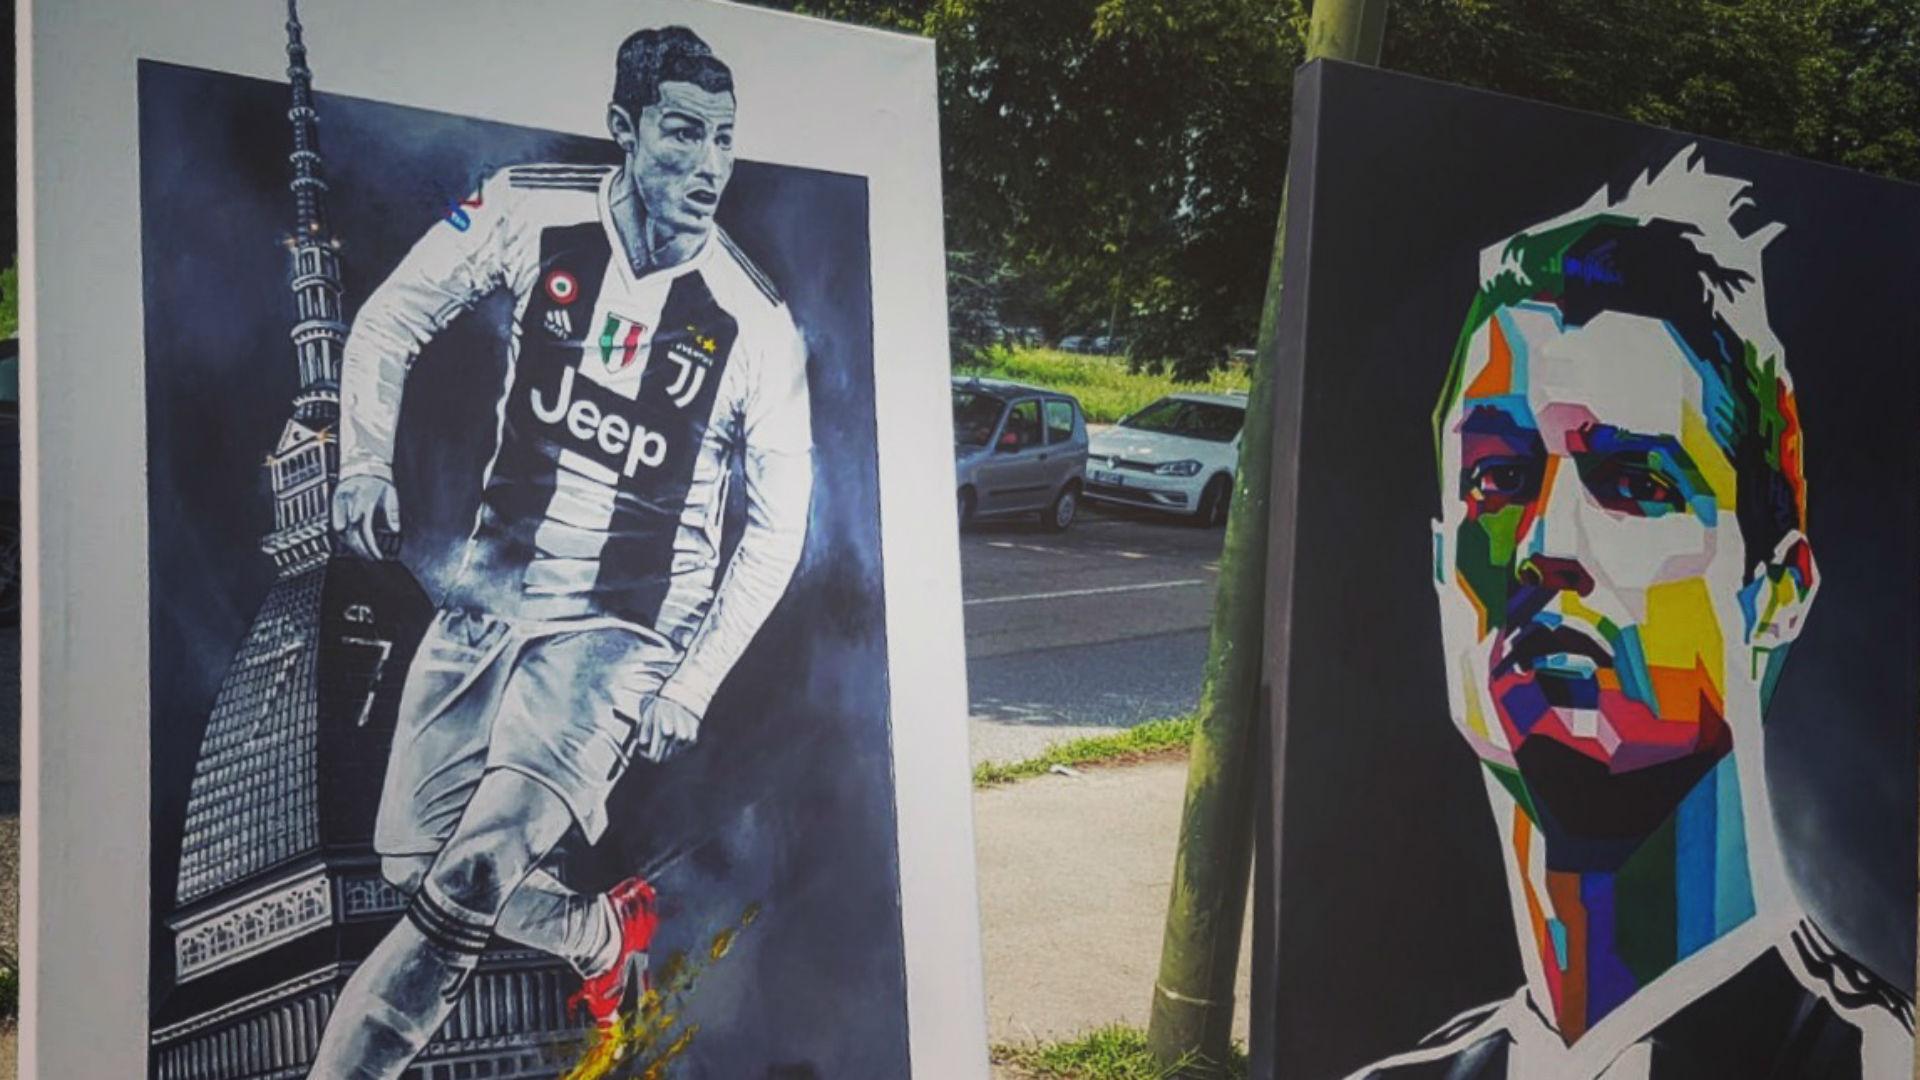 Milan, Caldara: